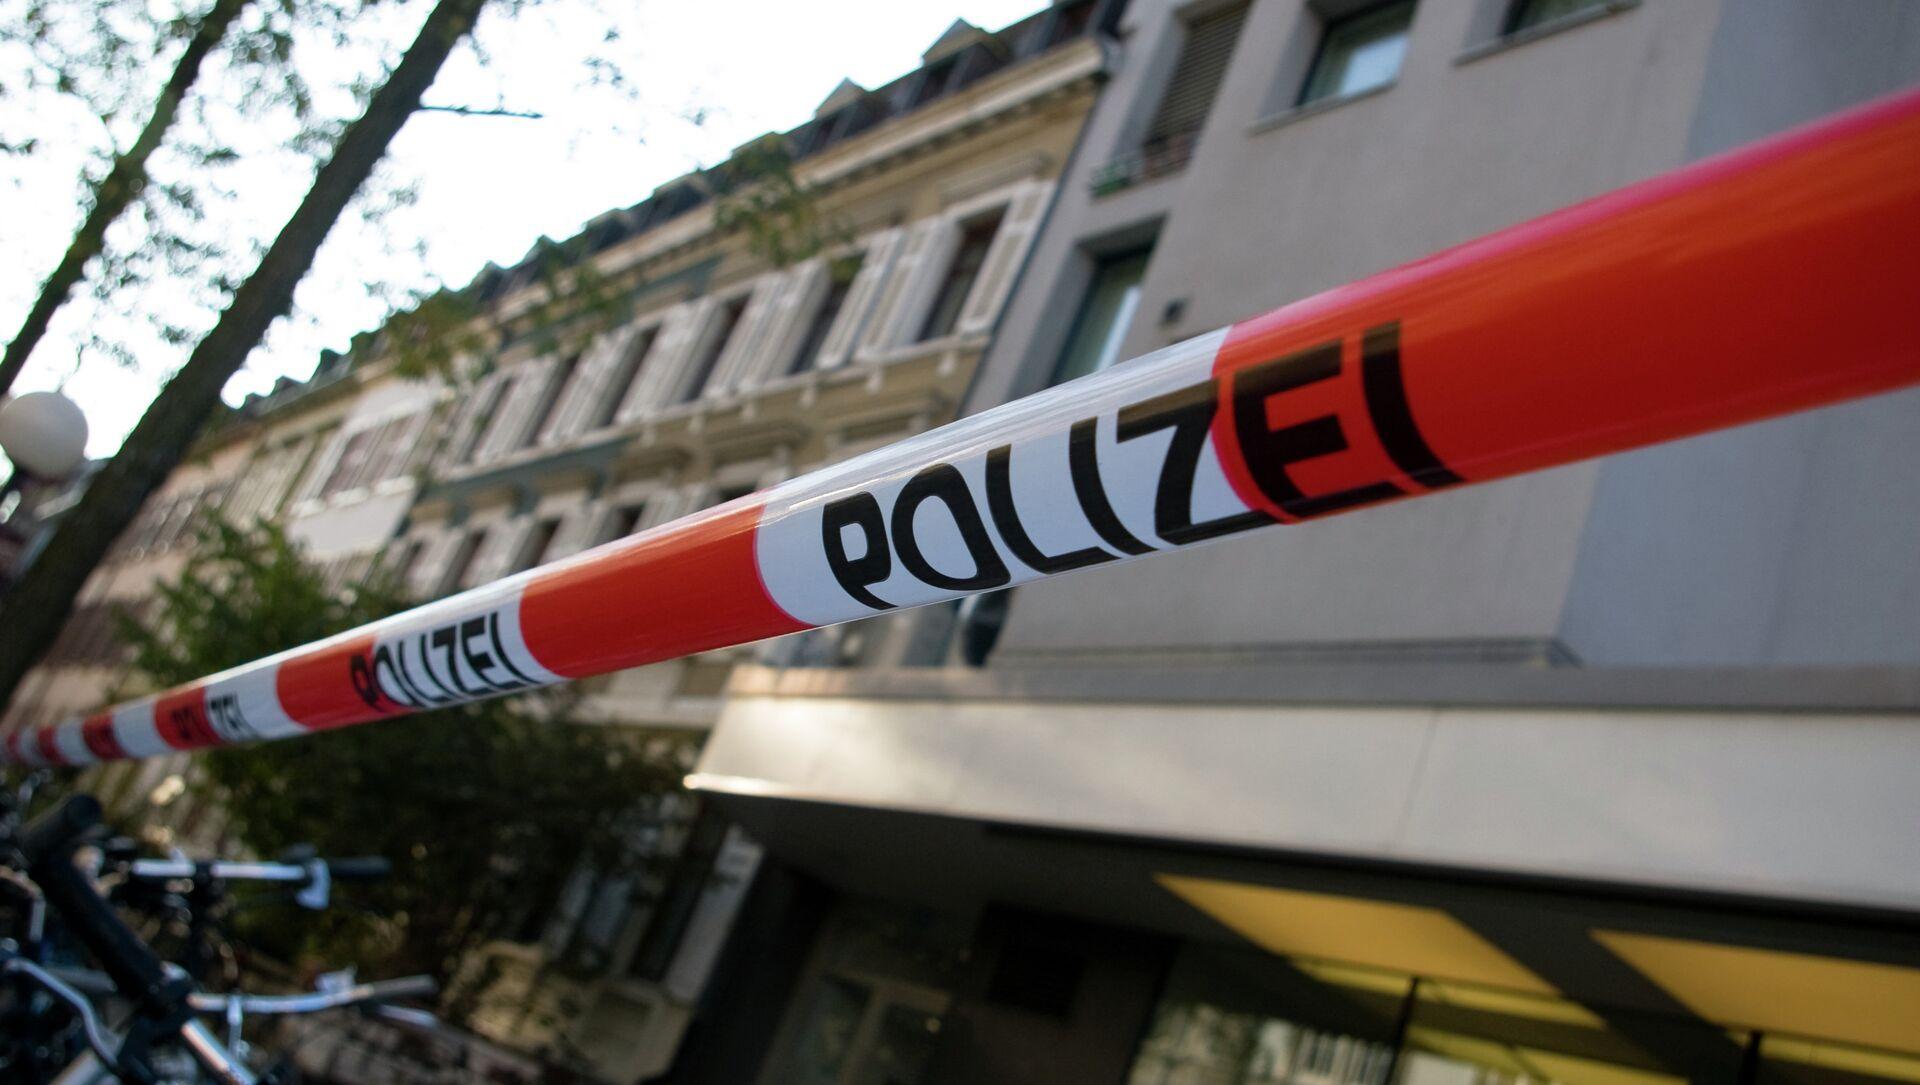 Swiss police (File photo) - Sputnik International, 1920, 02.08.2021